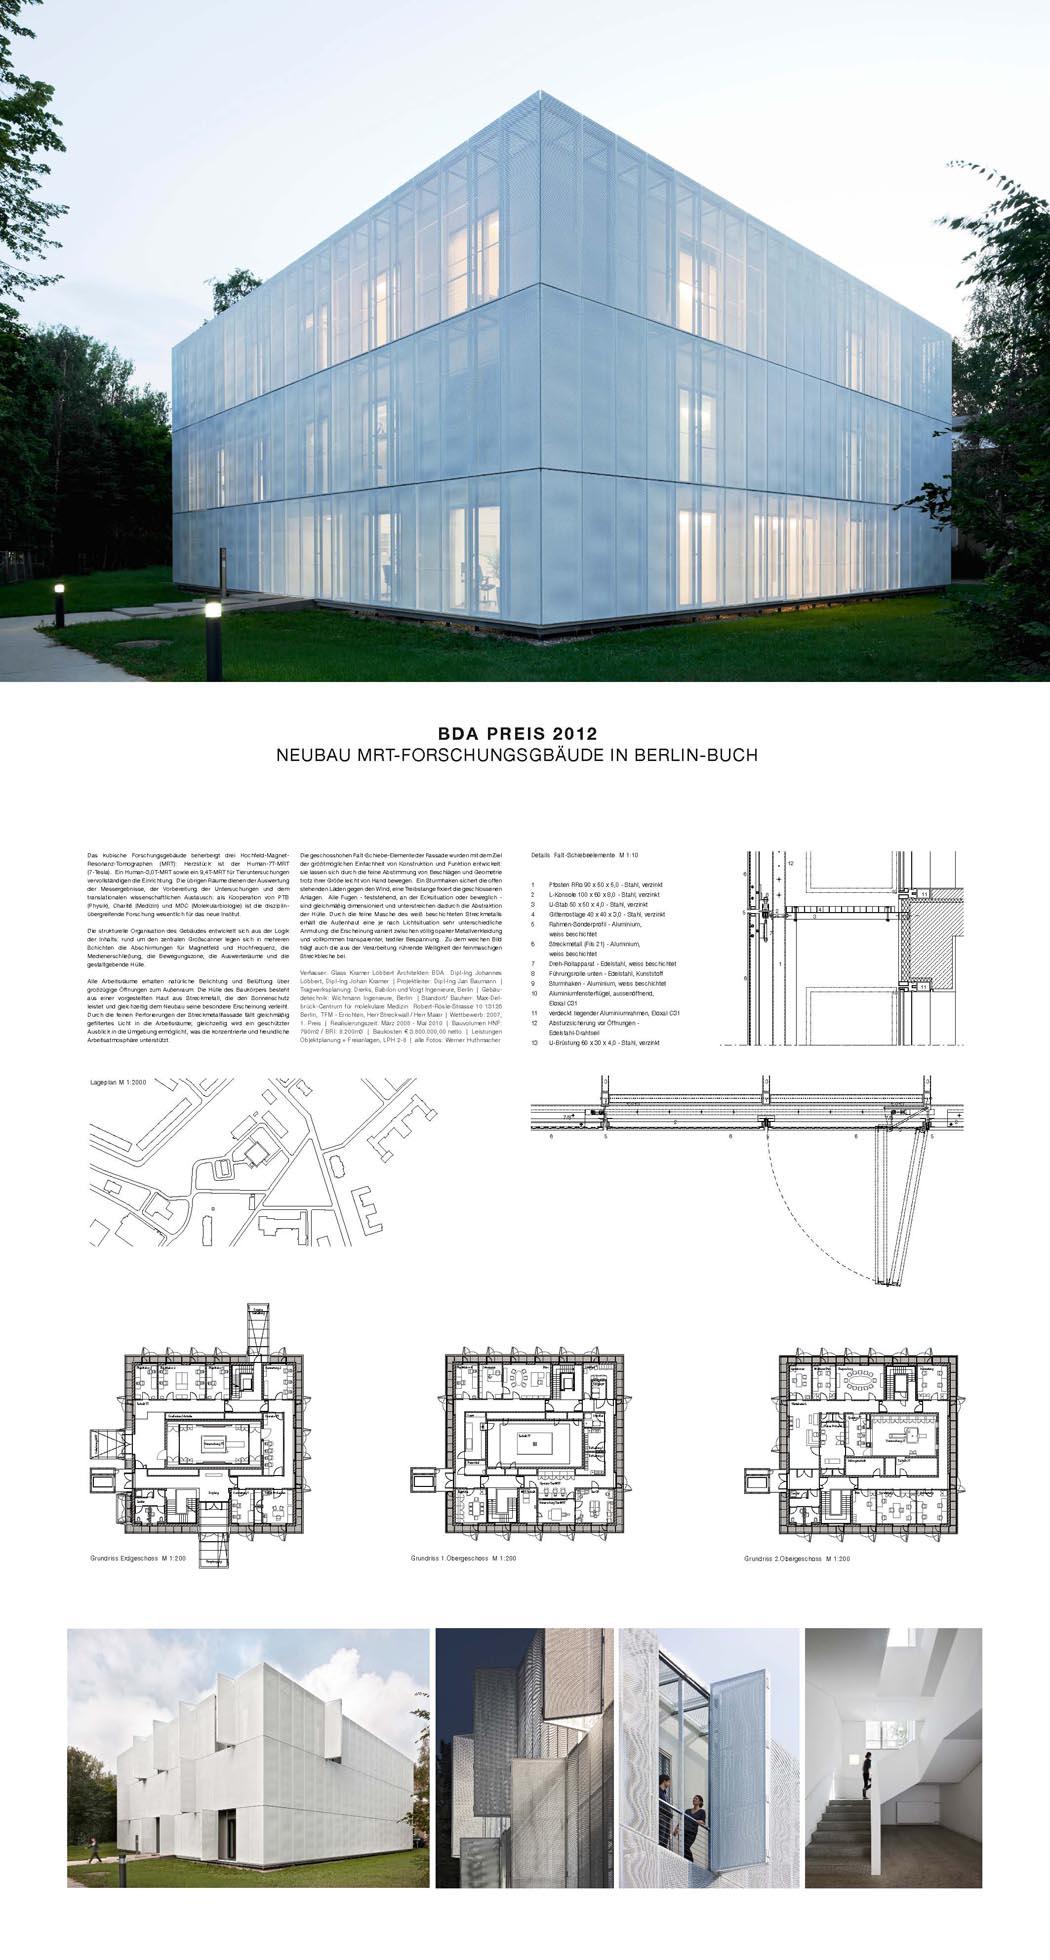 Architekten In Berlin 54 neubau mrt forschungsgebäude in berlin buch bda berlin publikumspreis